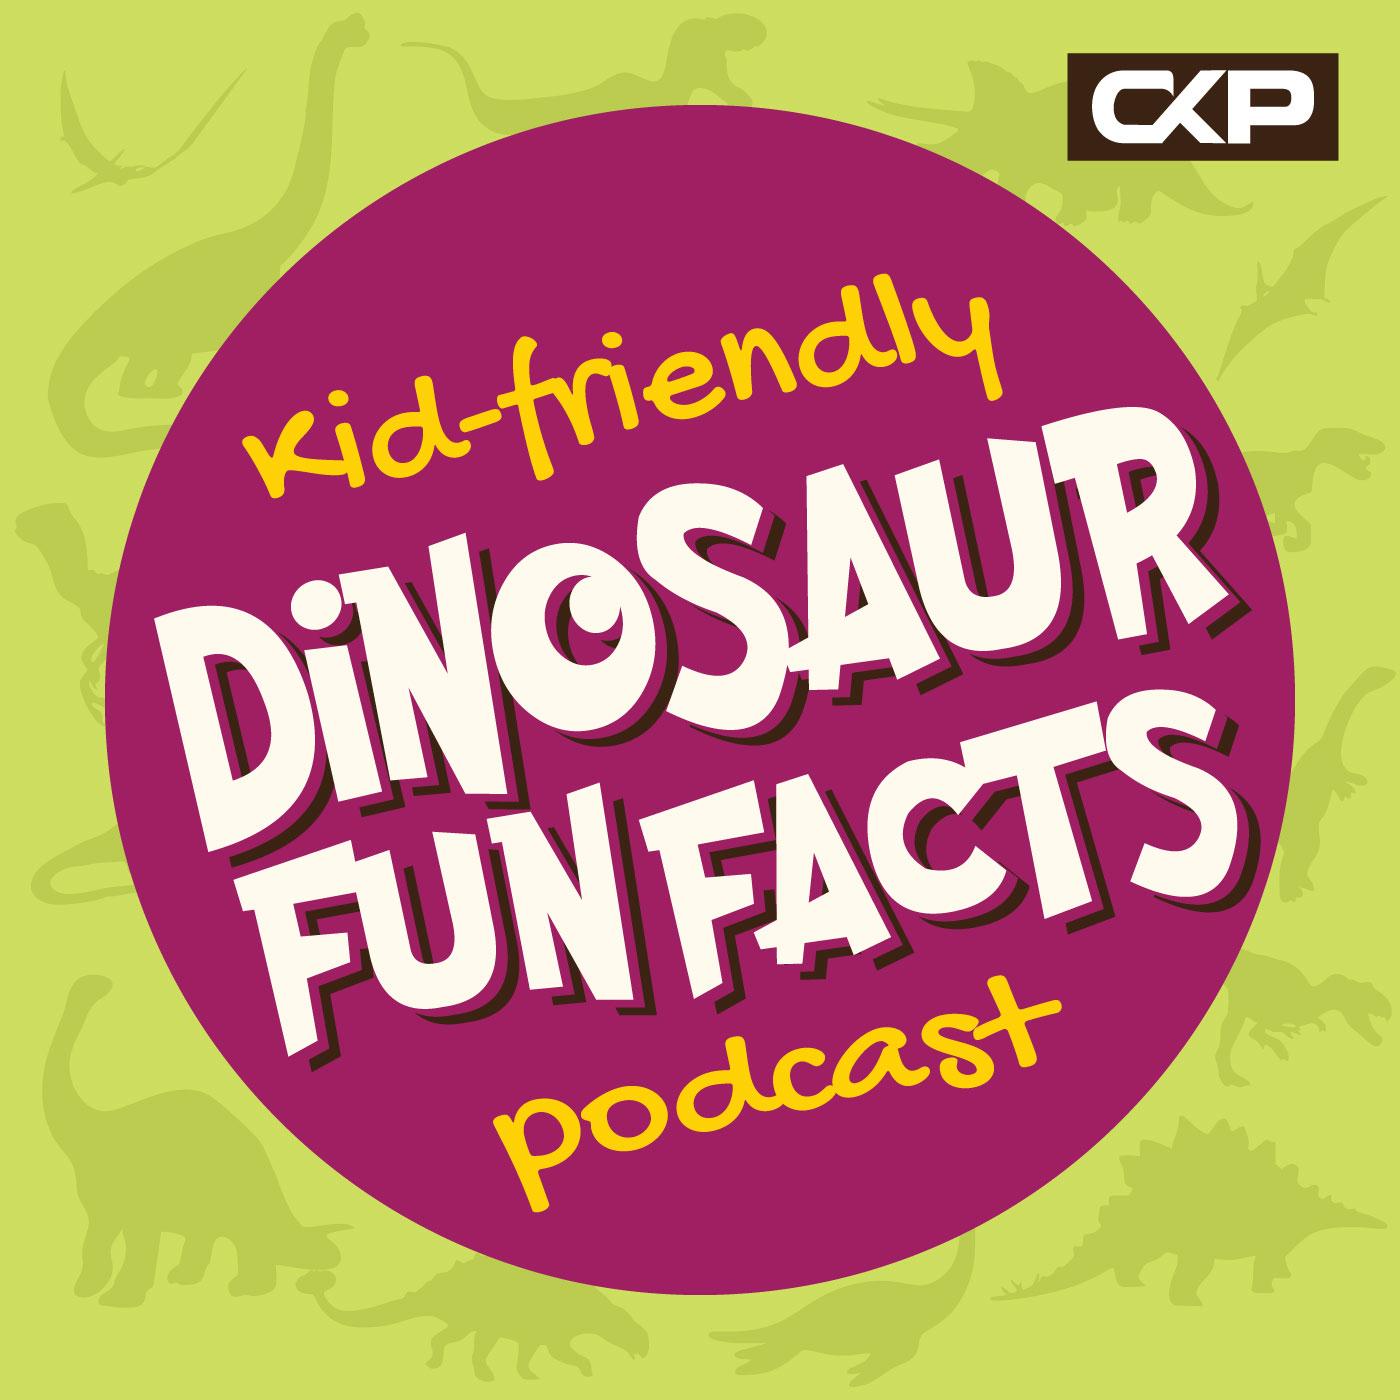 Kid Friendly Dinosaur Fun Facts Podcast